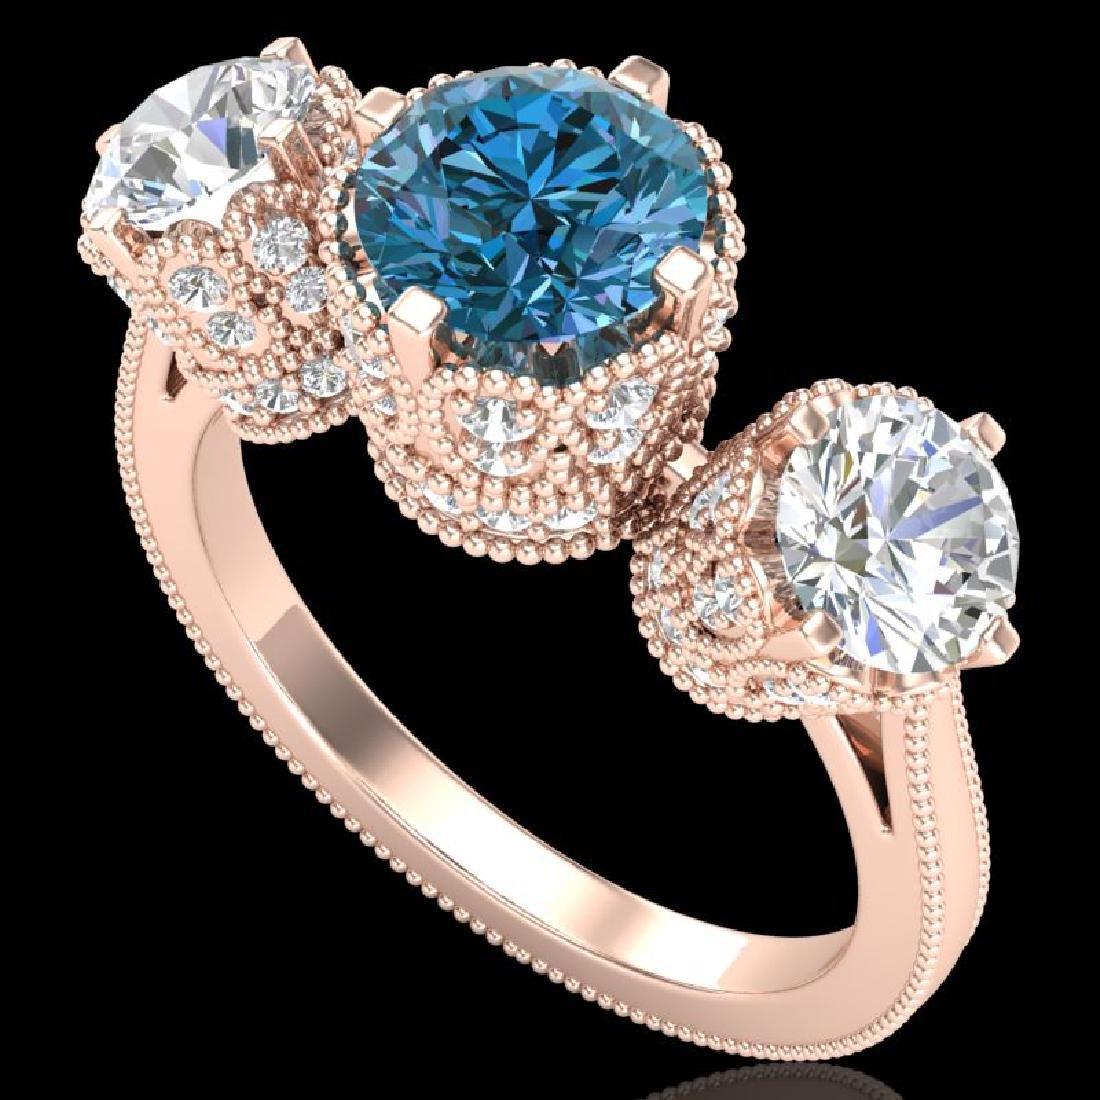 3.06 CTW Fancy Intense Blue Diamond Art Deco 3 Stone